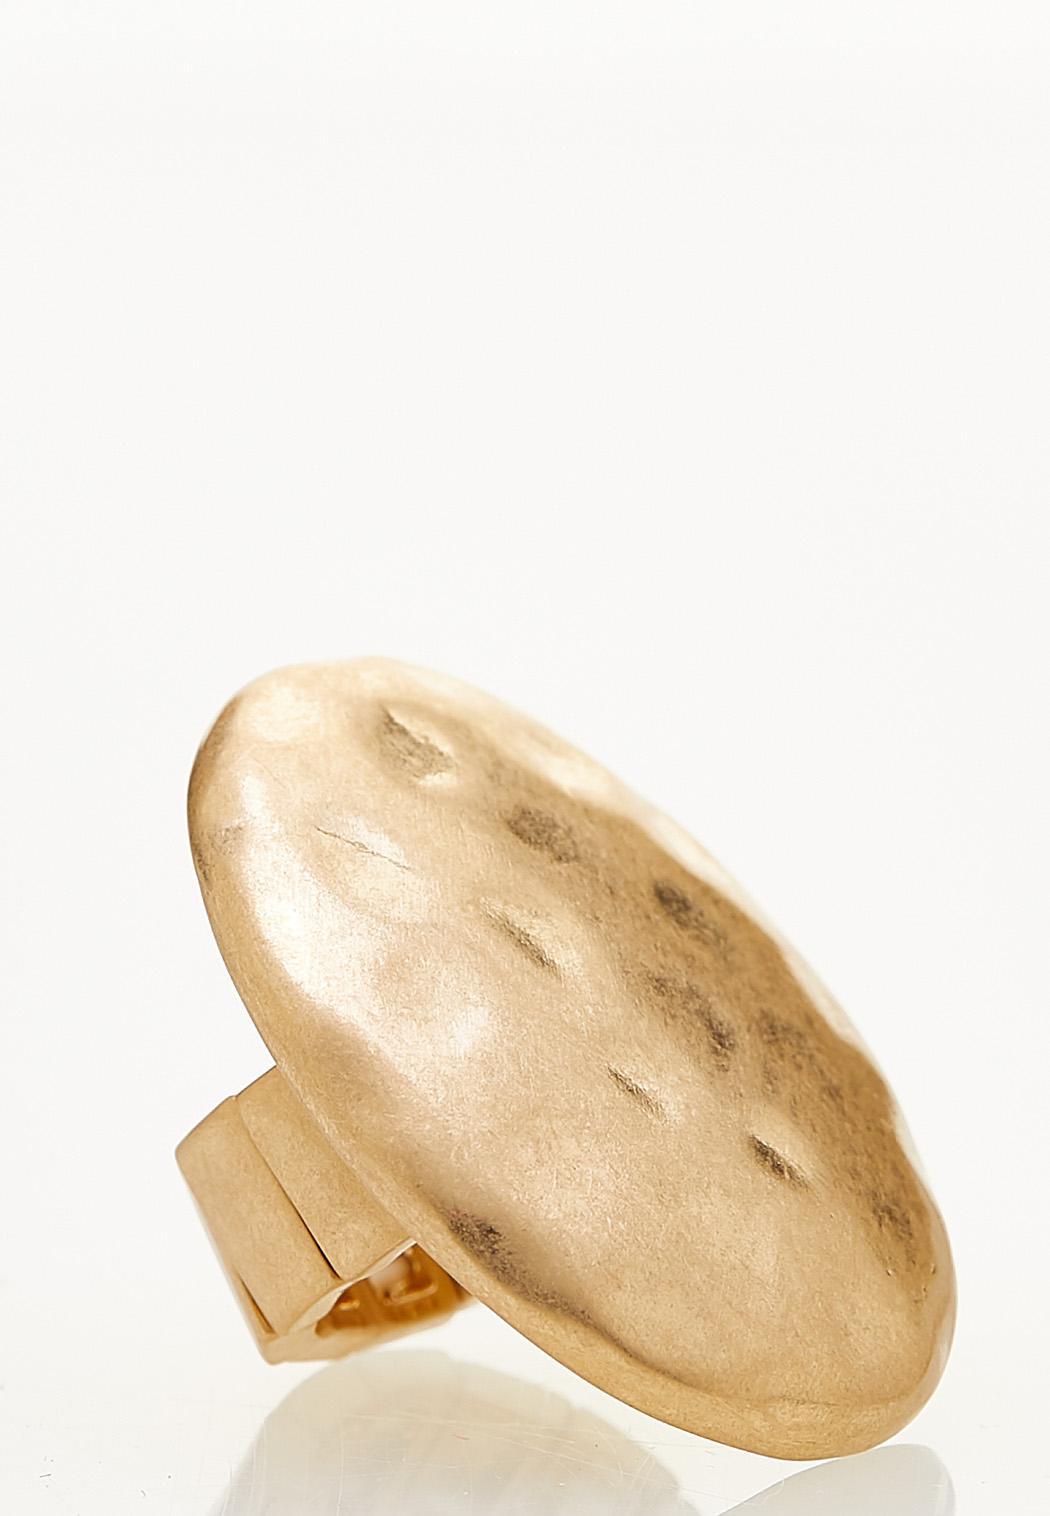 Worn Gold Stretch Ring